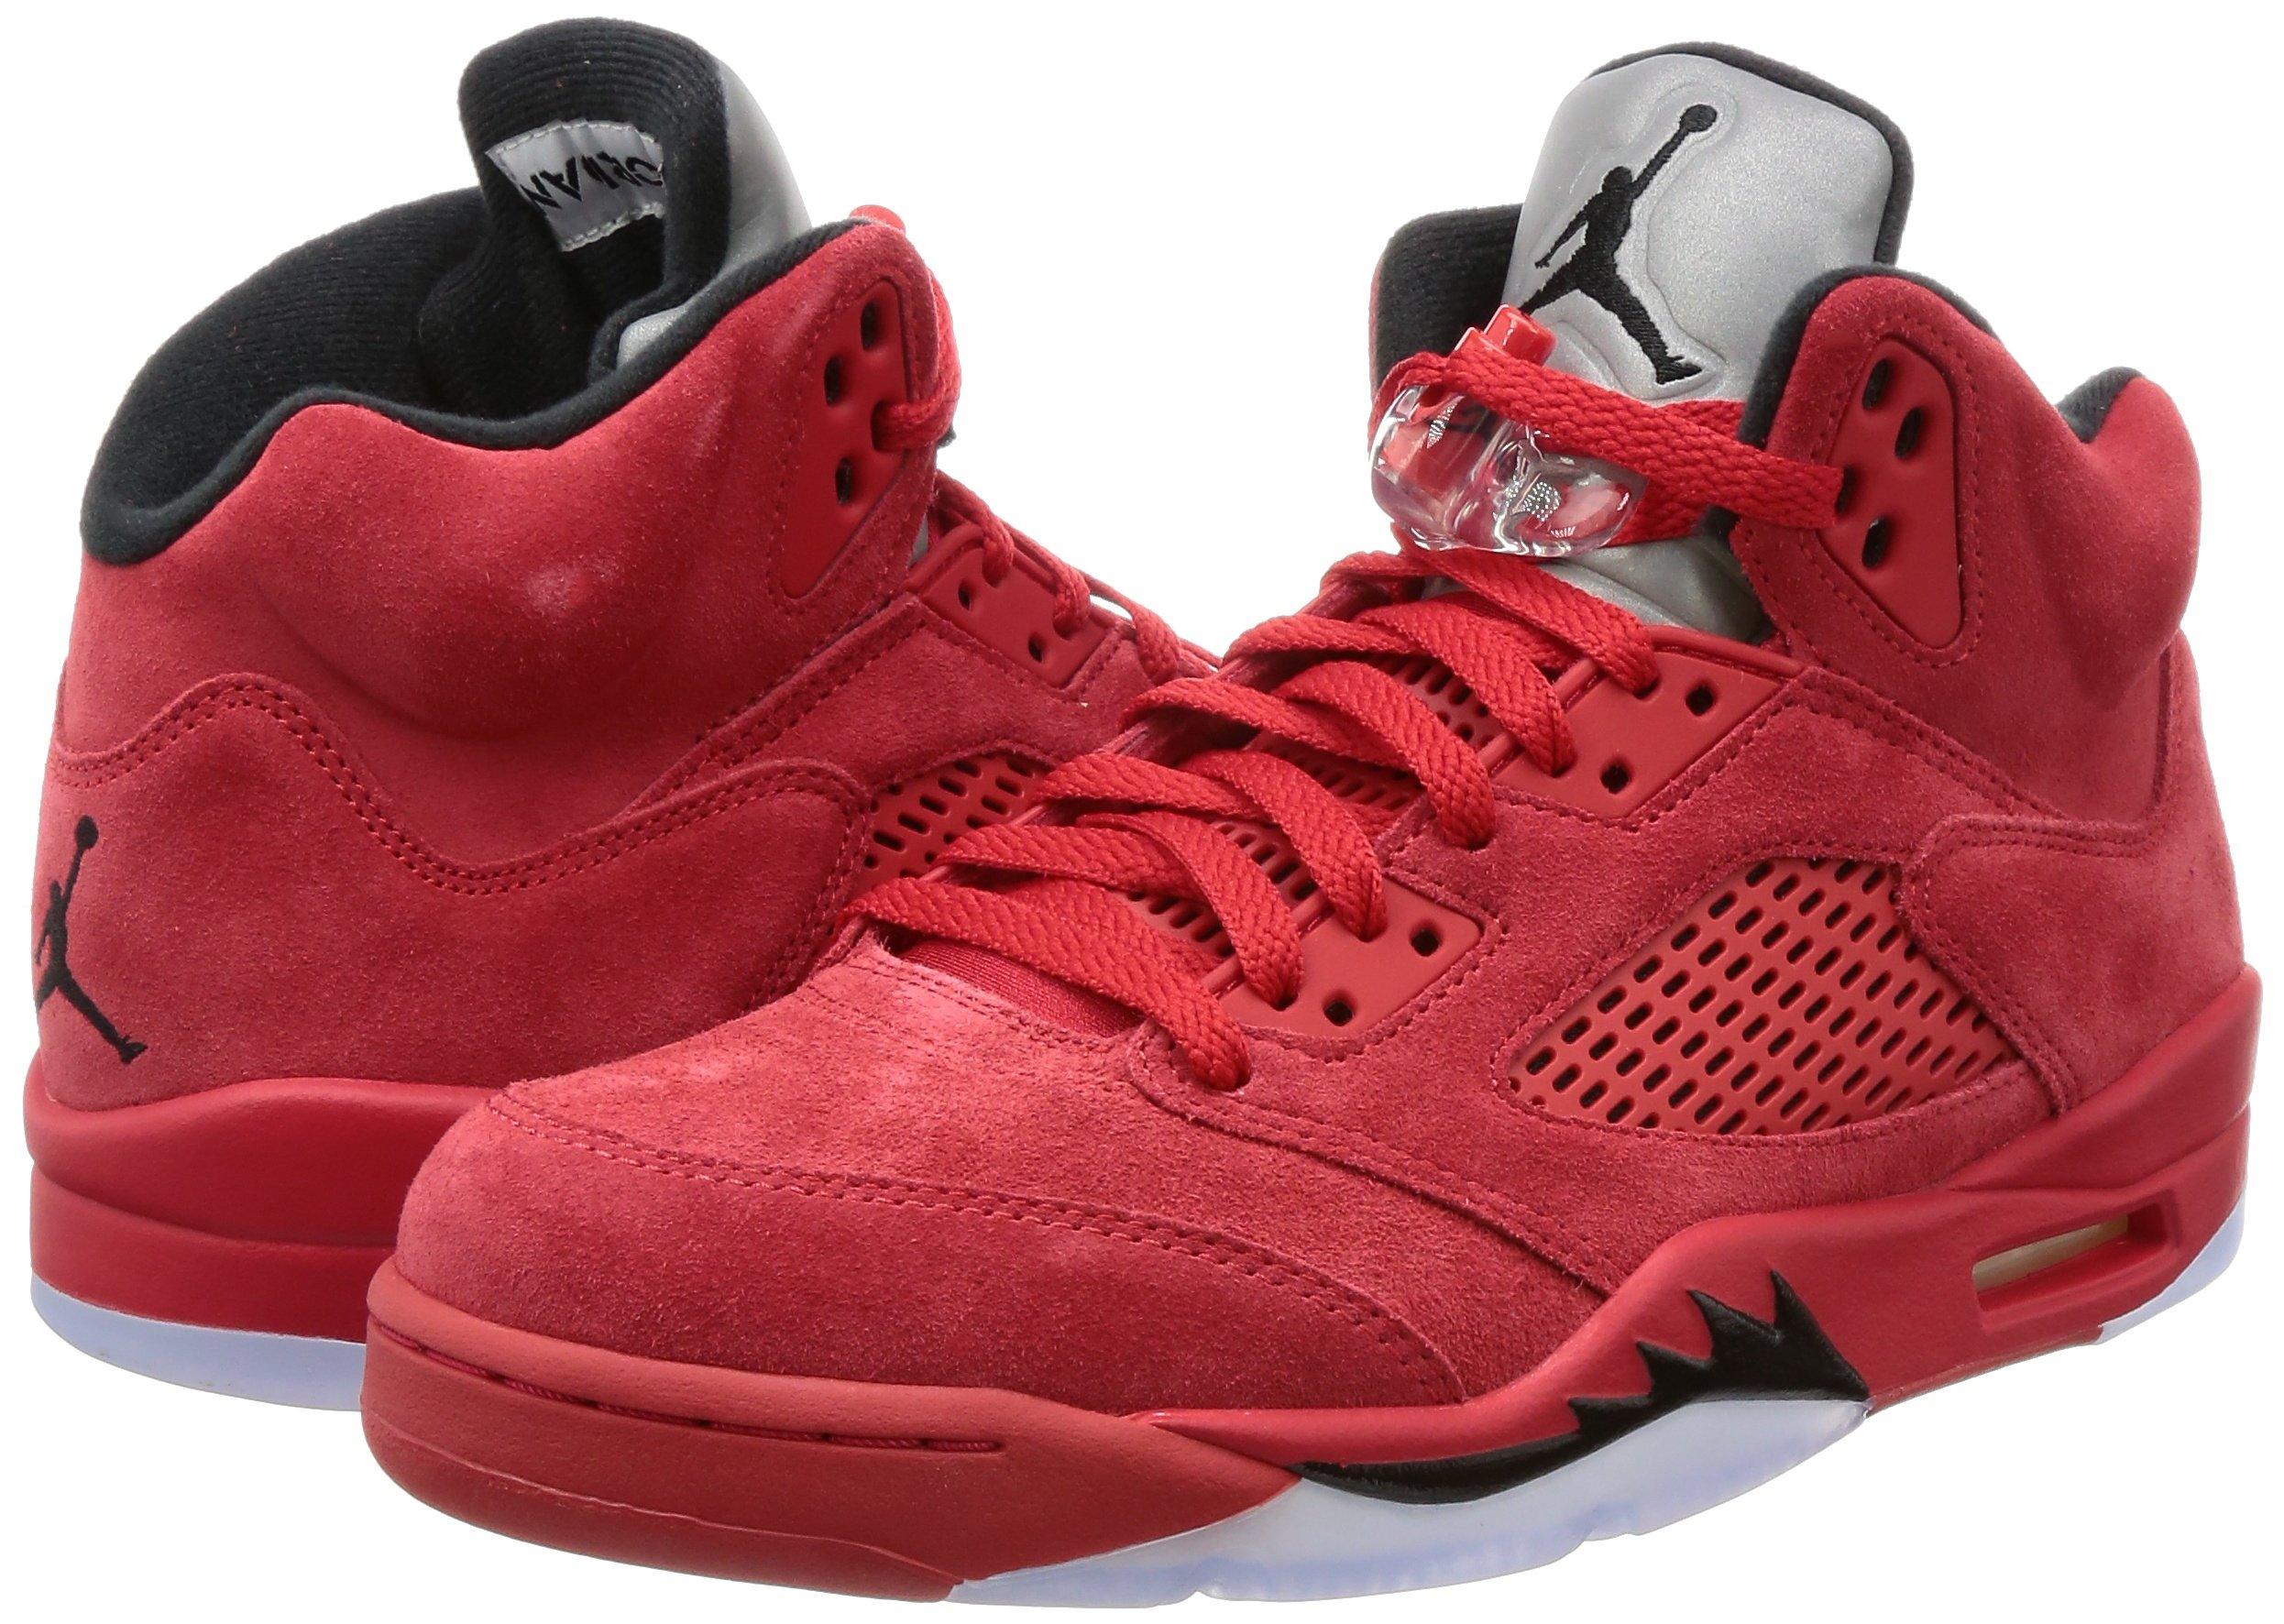 91Ih5TsL95L - Nike Air Jordan 5 Retro 'Red Suede' - 136027-602 - Size 9 -